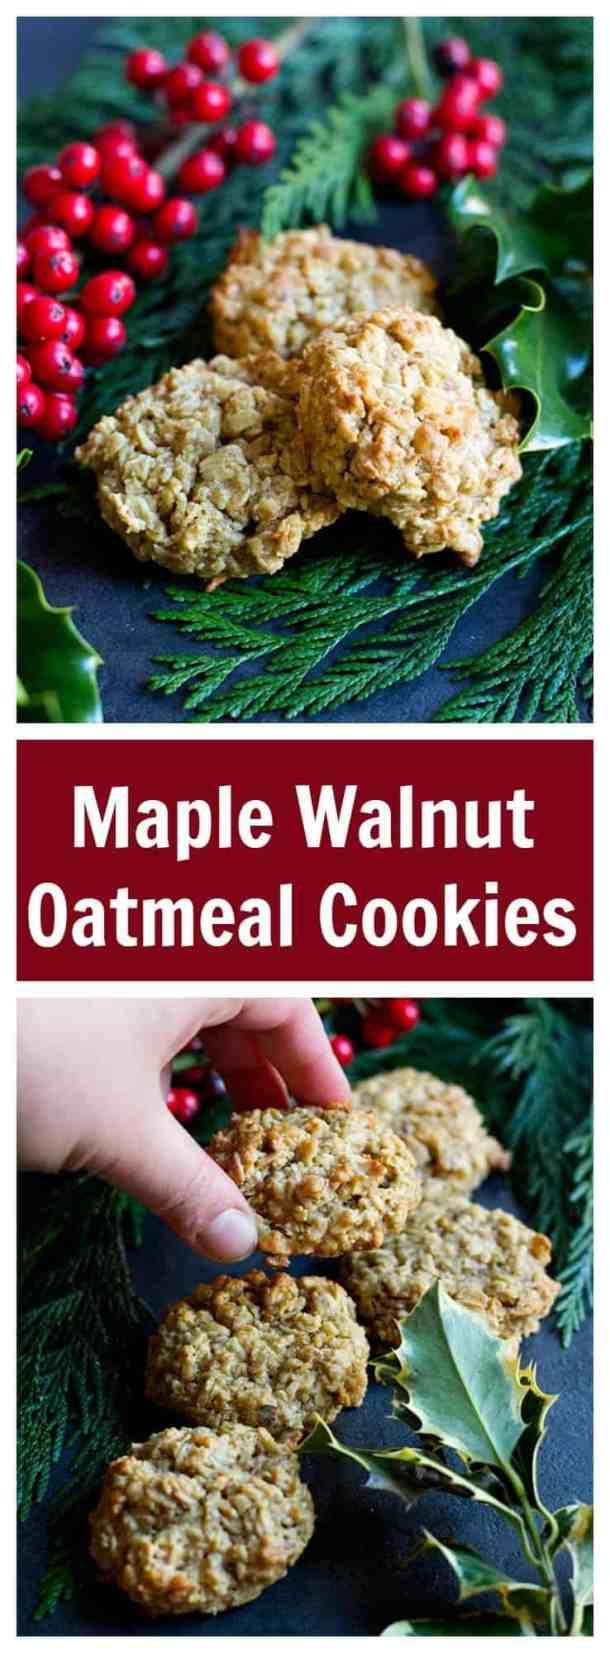 maple oatmeal cookies | maple oatmeal cookies recipe | maple oatmeal cookies healthy baking | #HolidayBaking #ChristmasBaking #Cookies